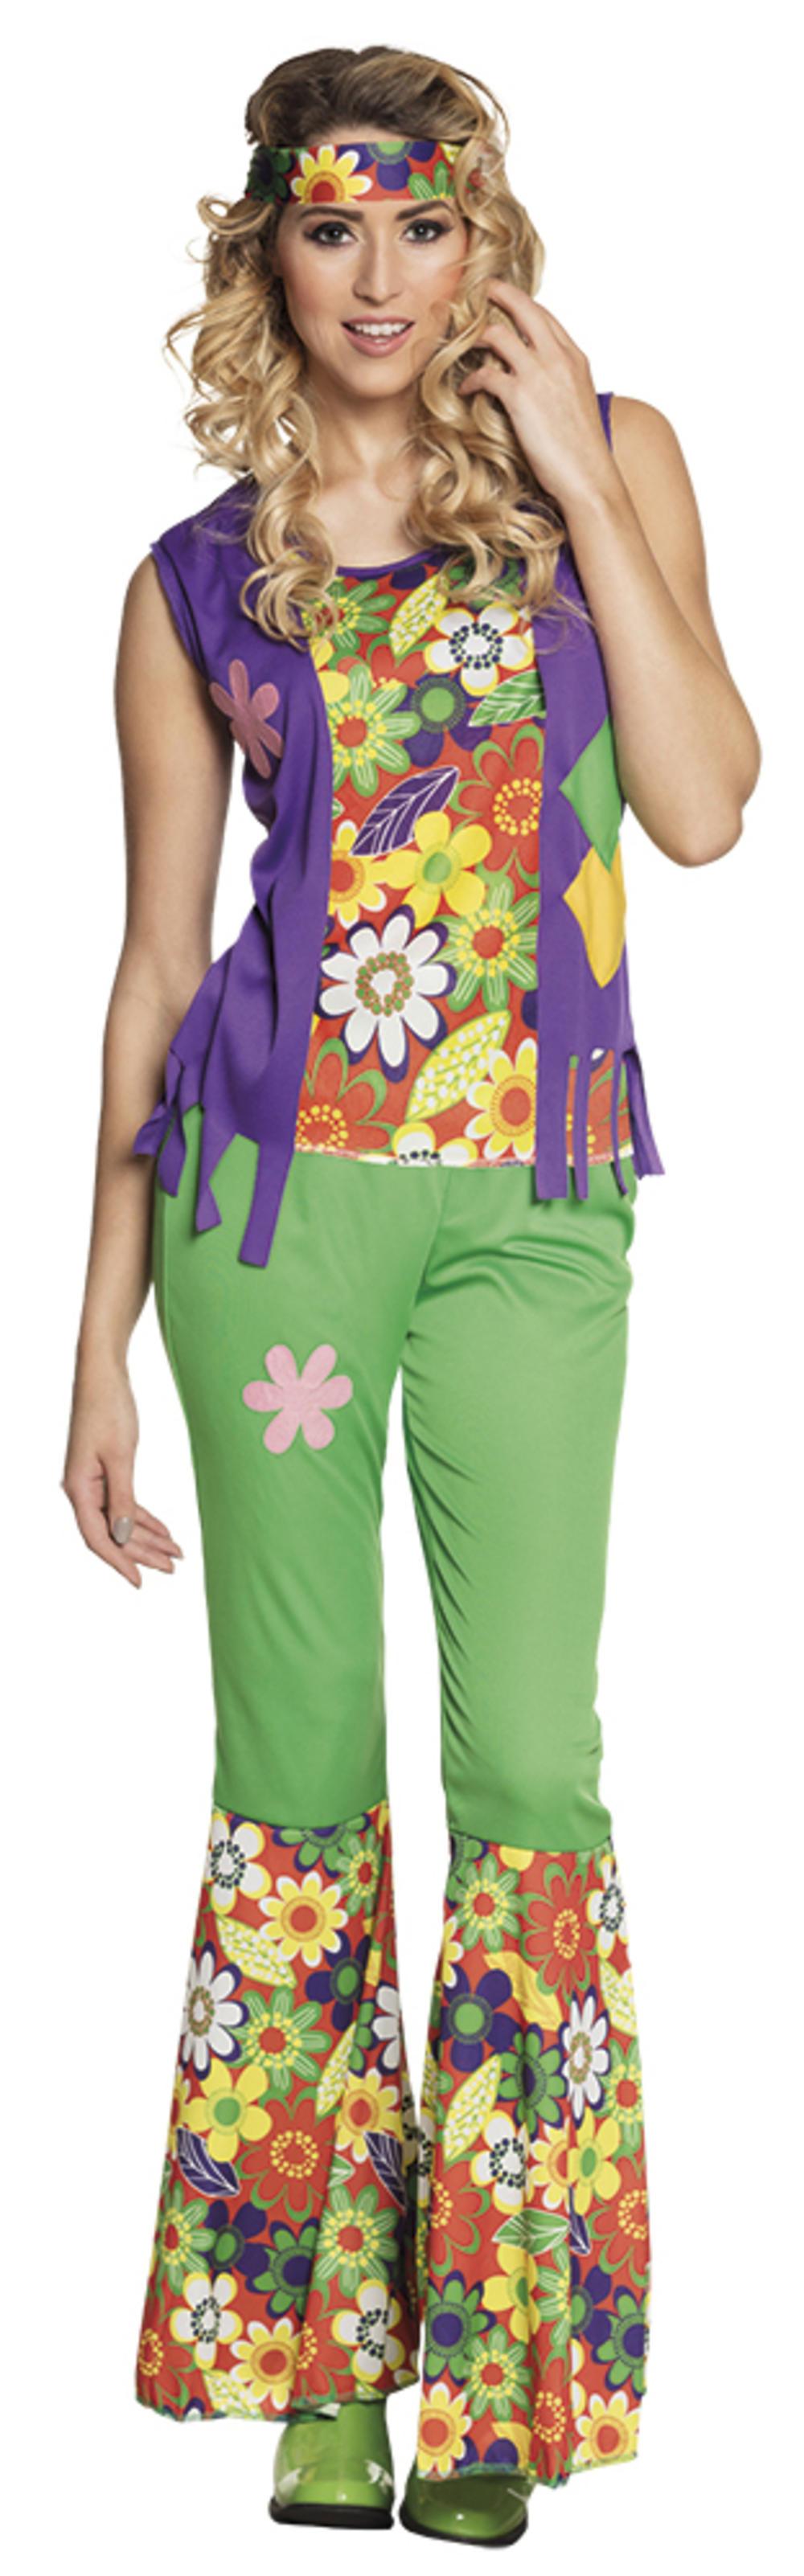 Woodstock Woman Costume